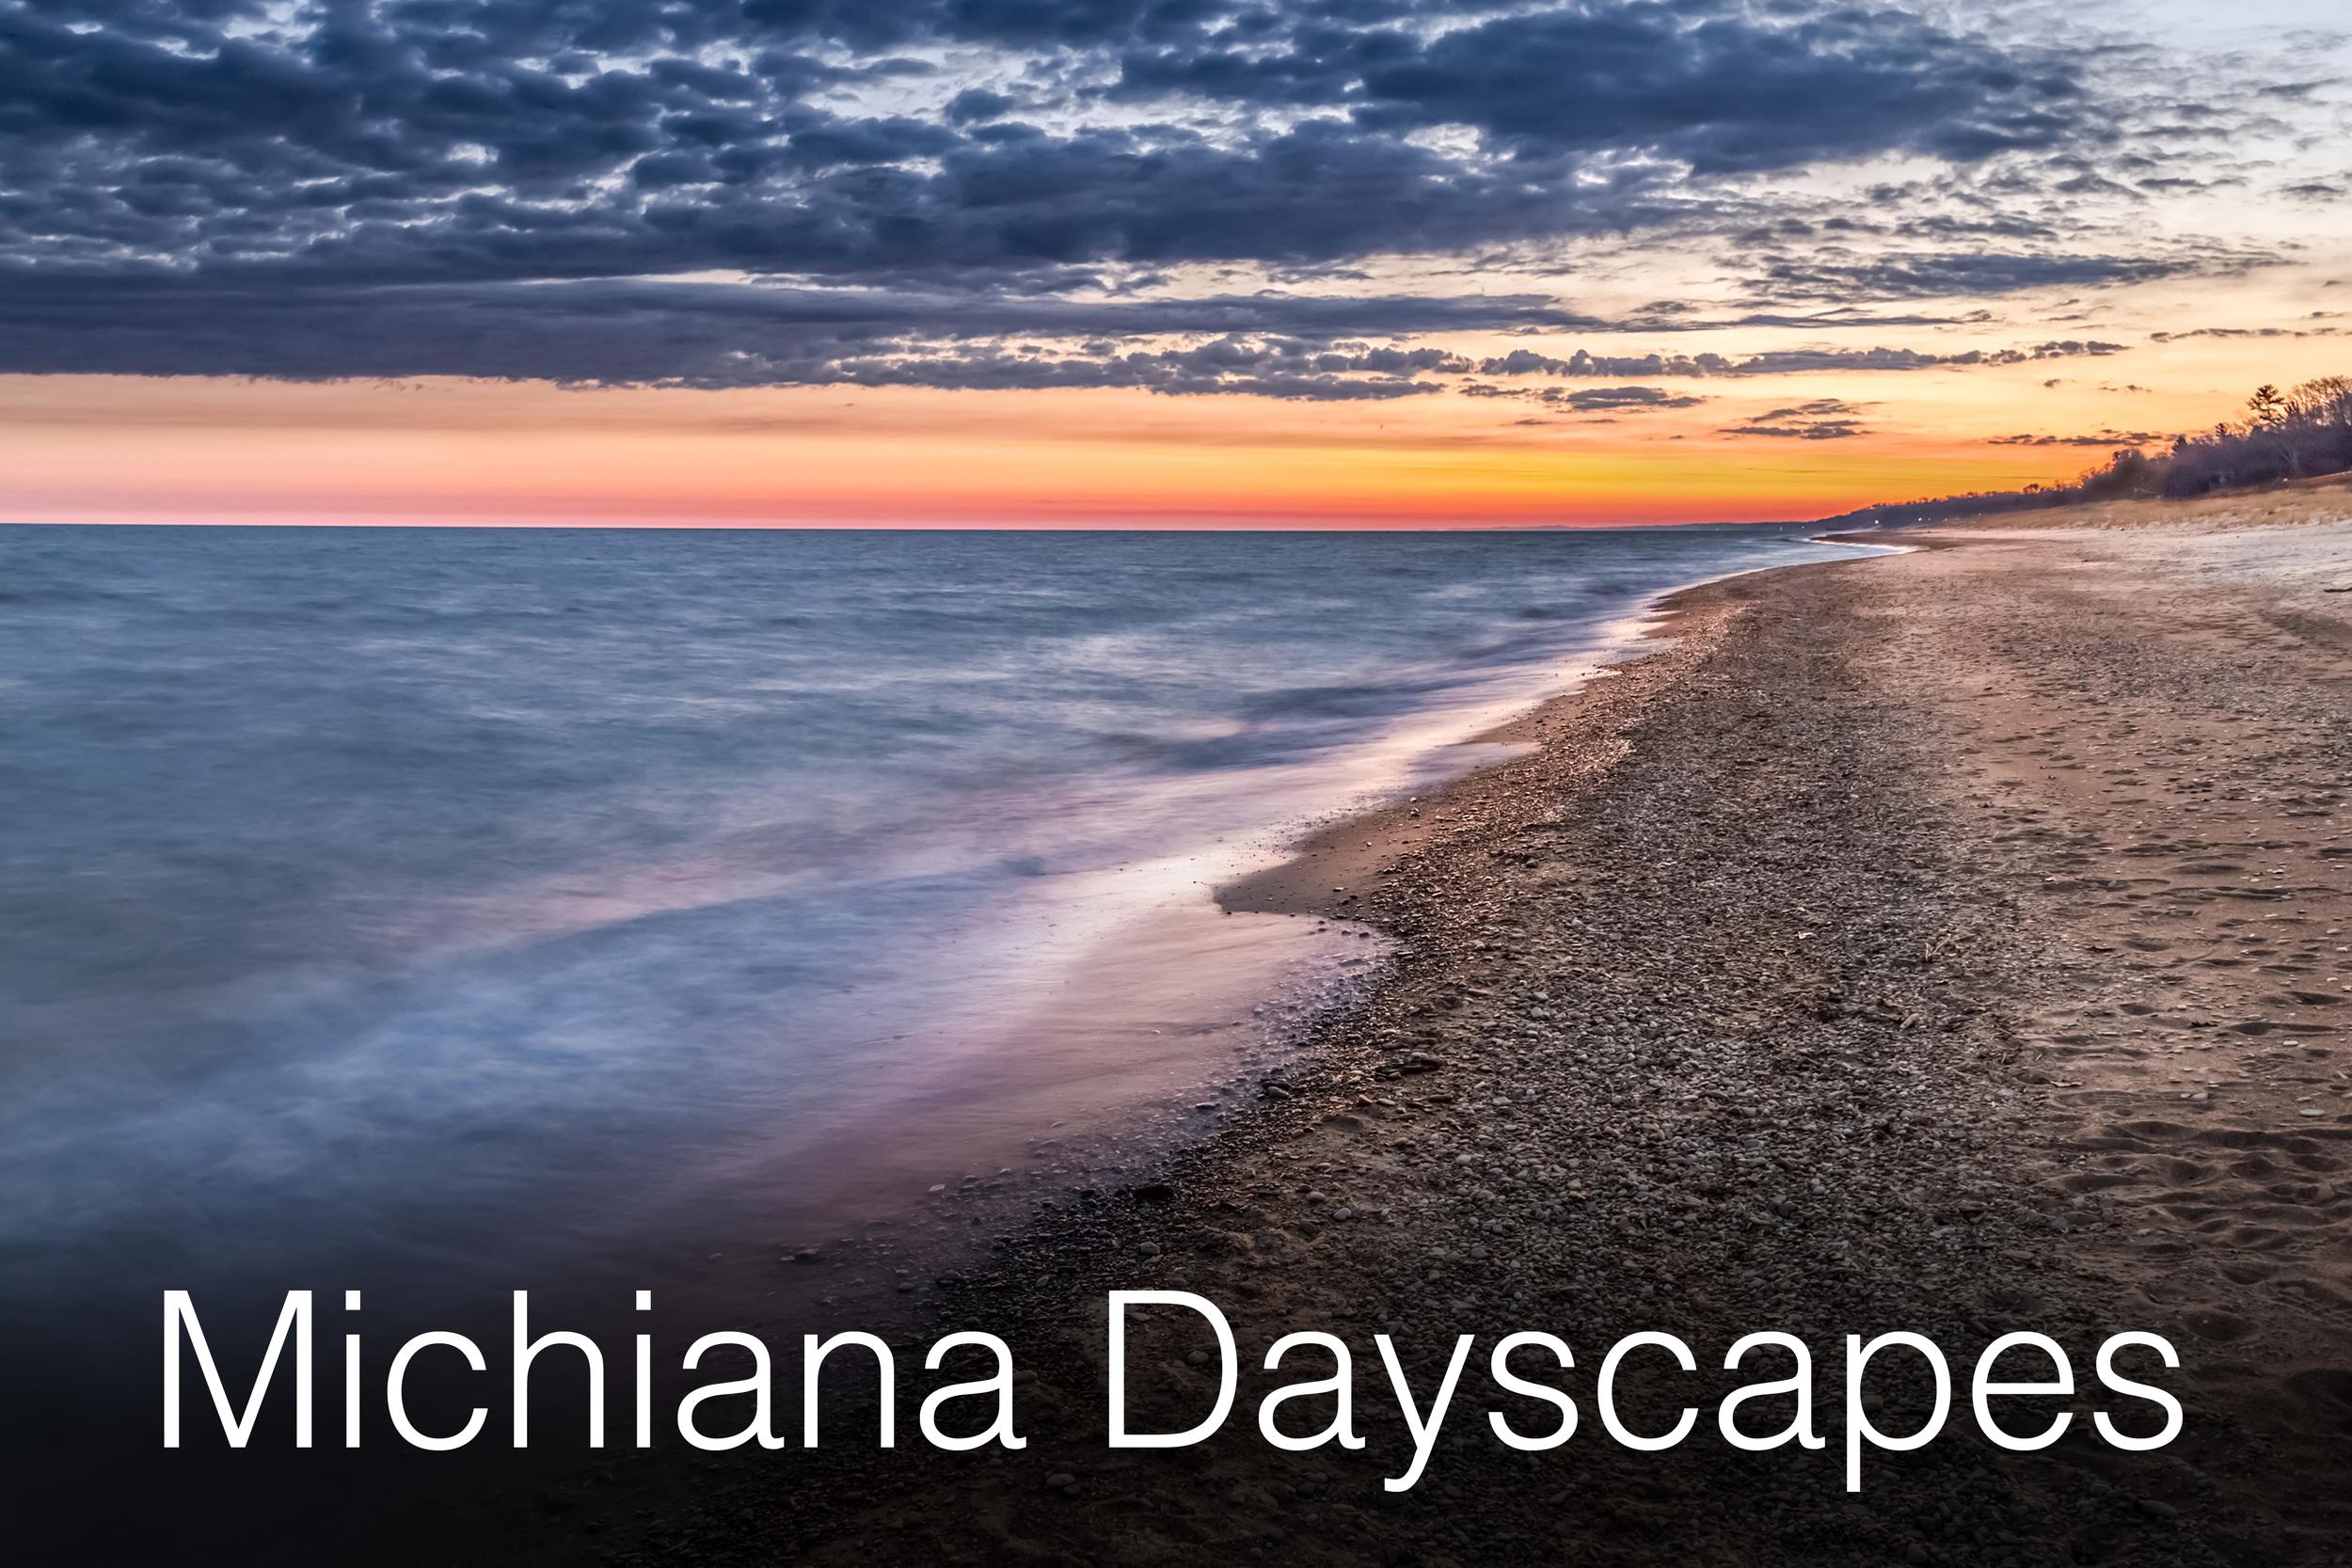 michiana_dayscapes.jpg